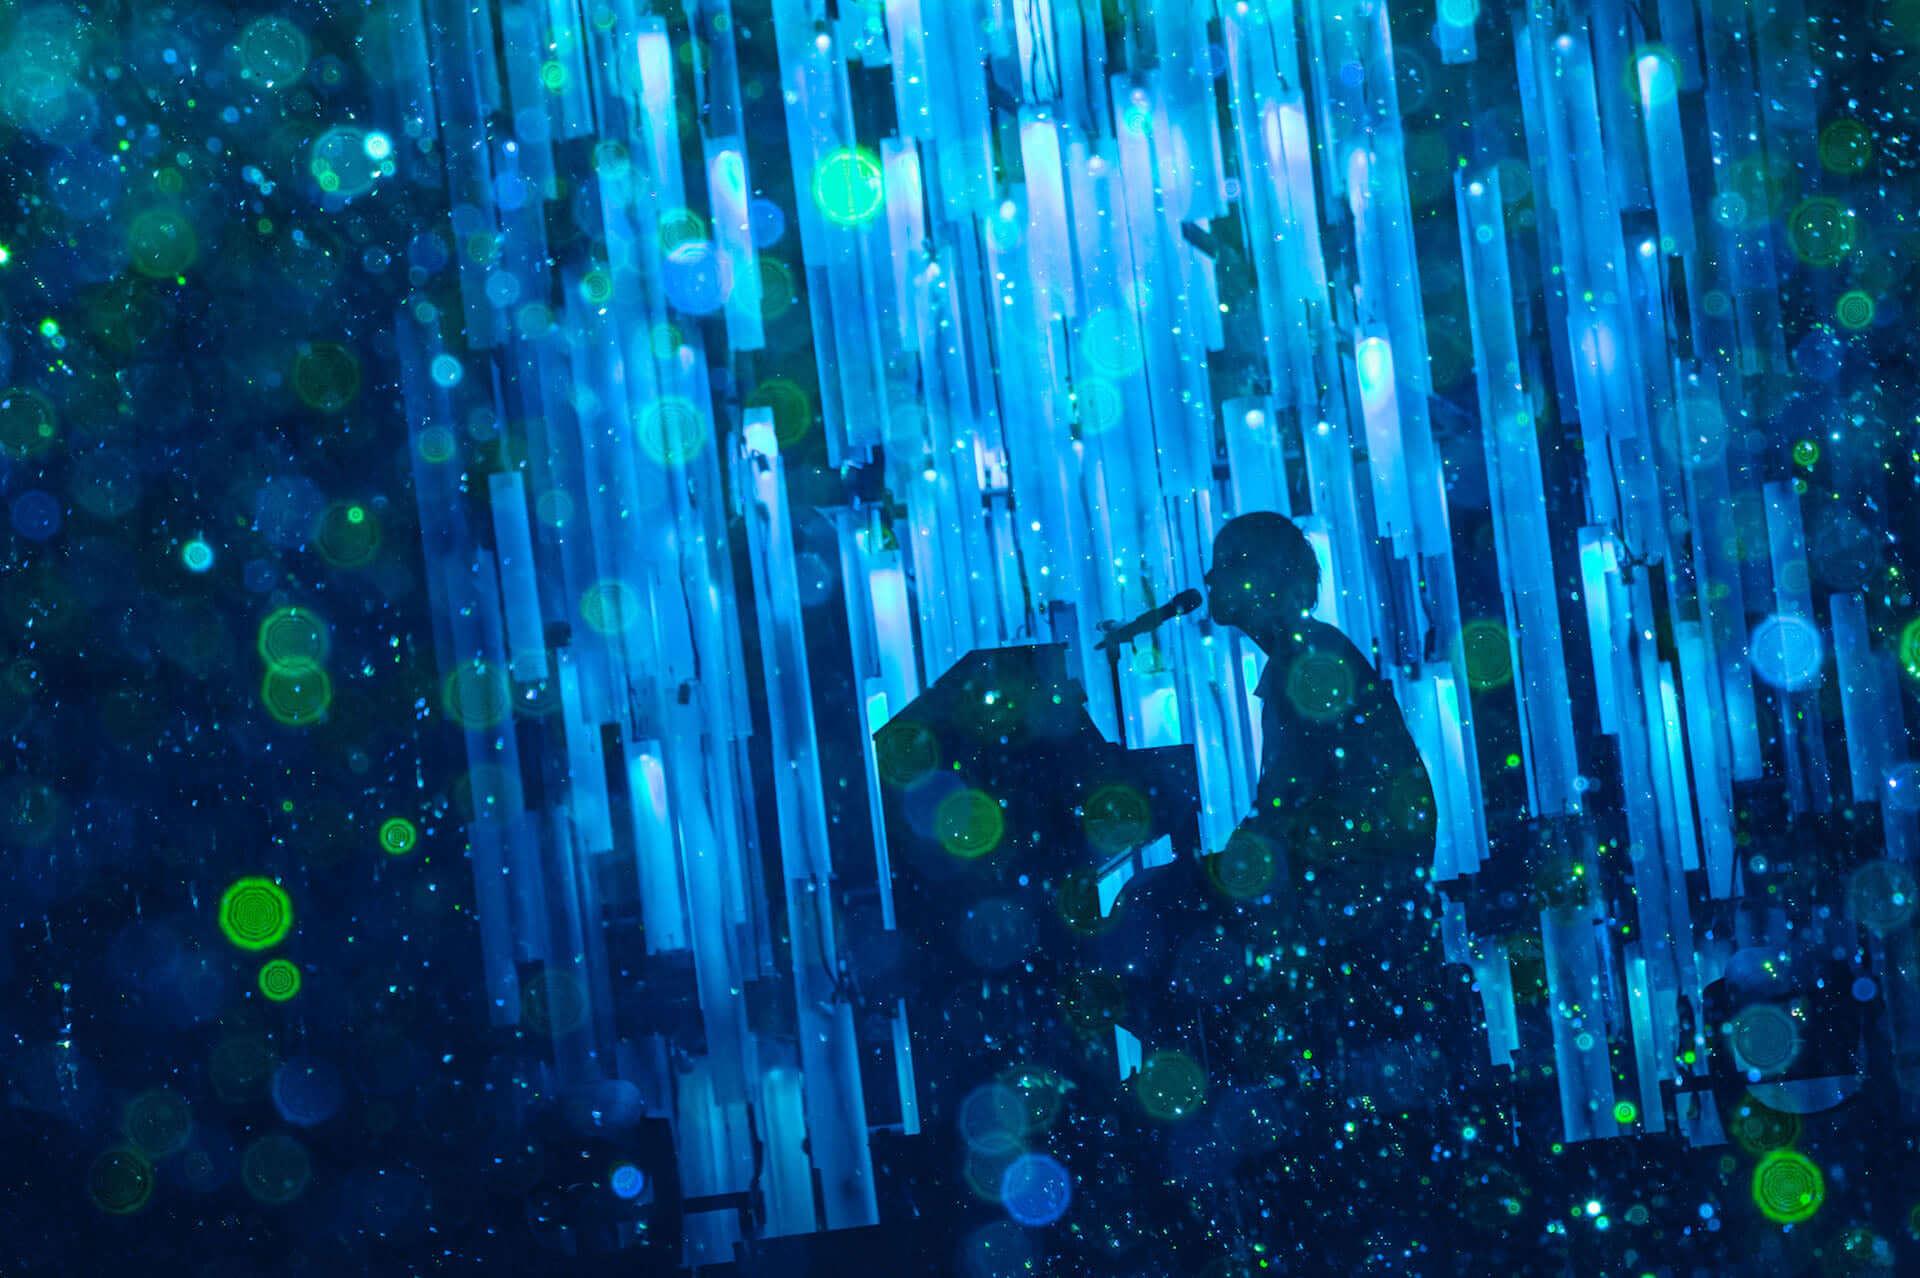 RADWIMPS横浜アリーナ公演のライブ写真が公開!<ANTI ANTI GENERATION TOUR 2019>レポート music190830_radwimps_live_11-1920x1278